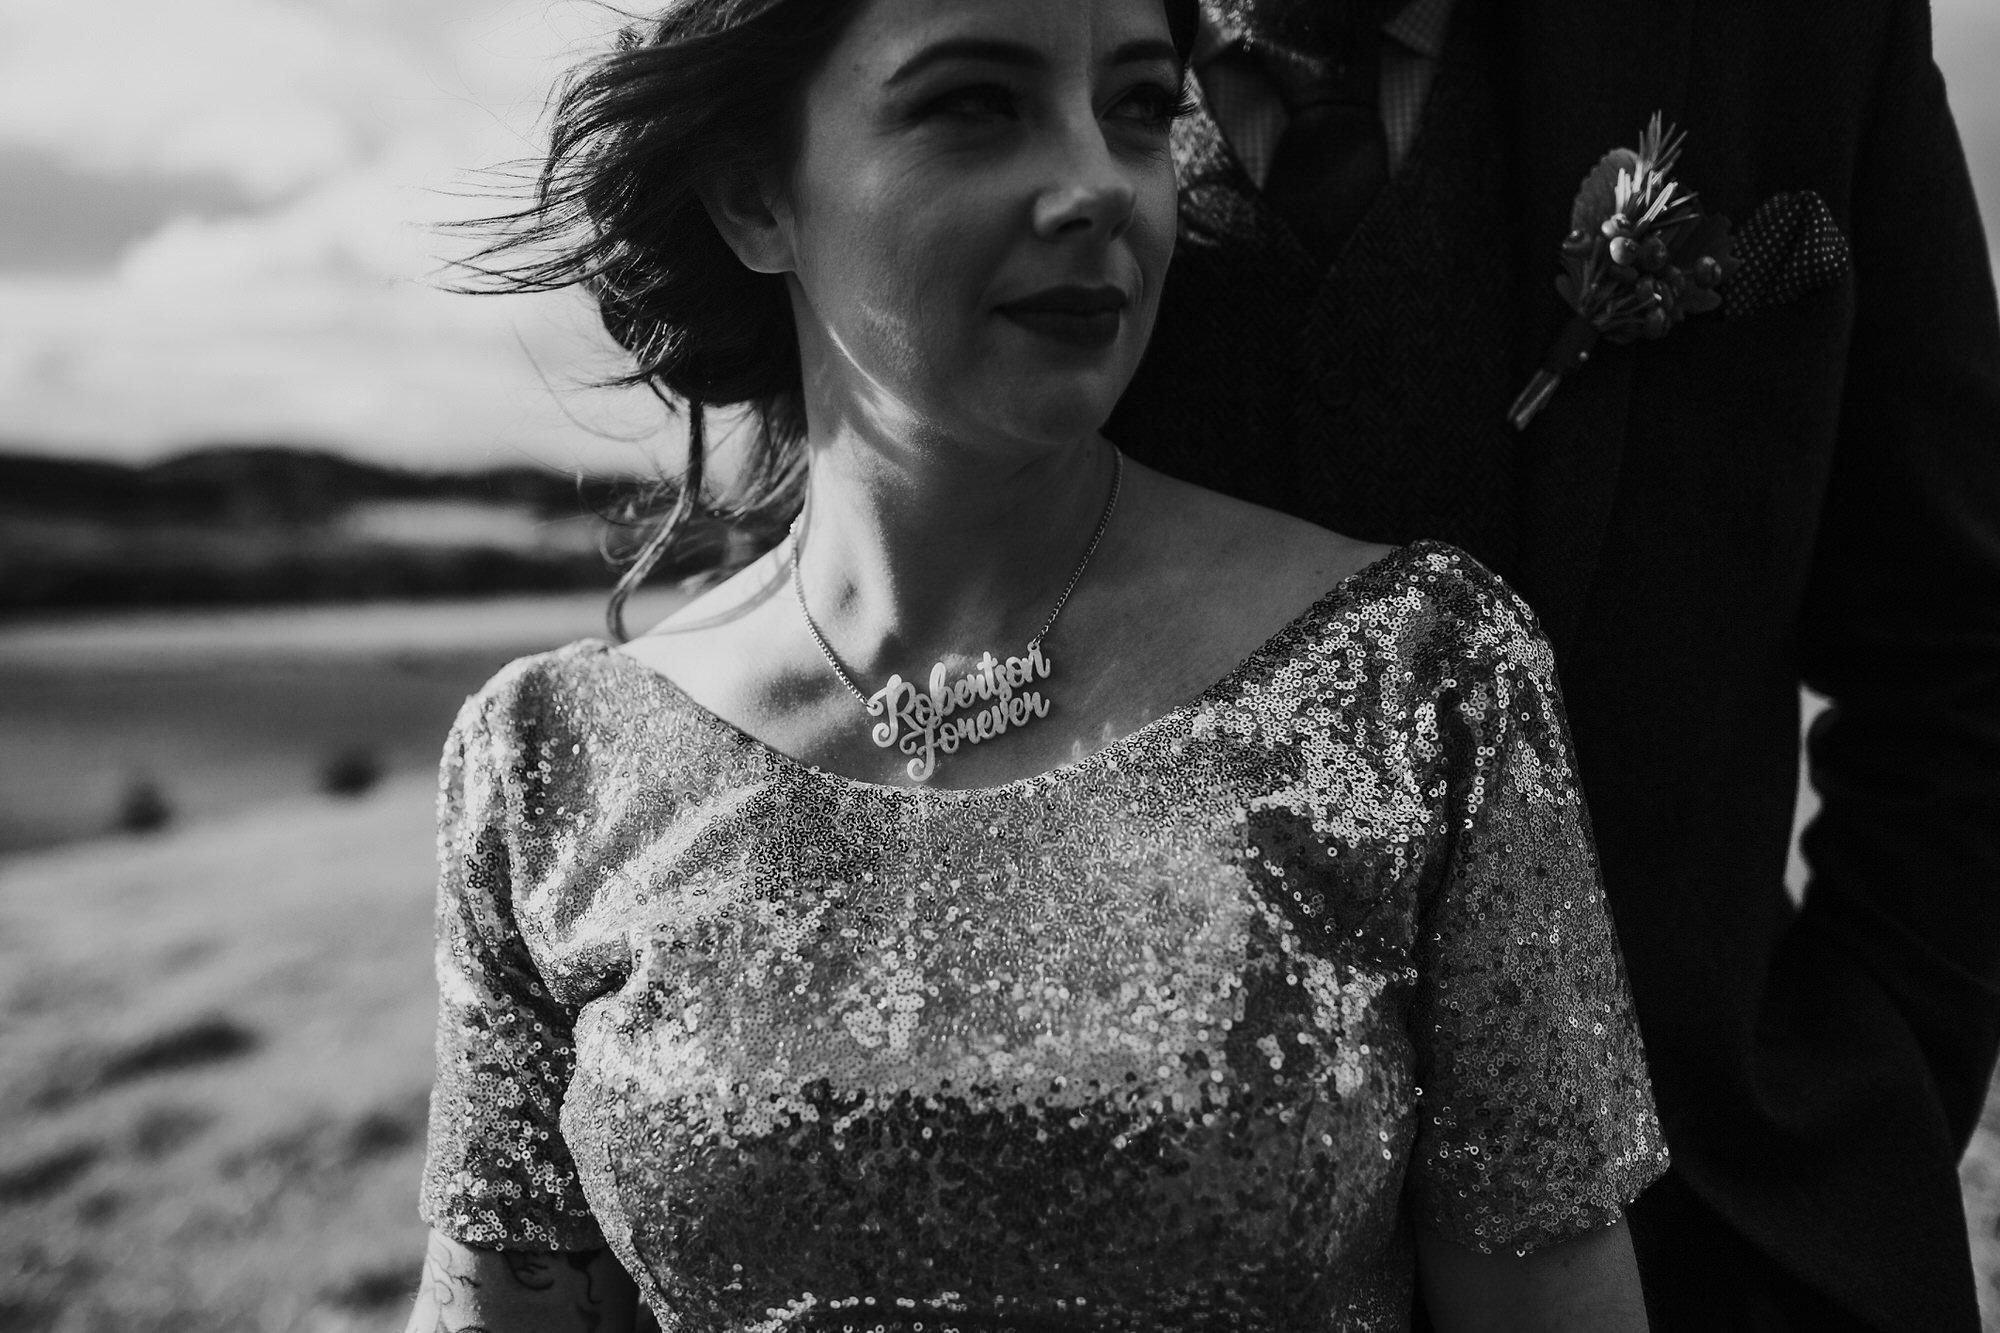 047 TIN SHED KNOCKRAICH FARM WEDDING ALTERNATIVE BRIDE ZOE ALEXANDRA PHOTOGRAPHY